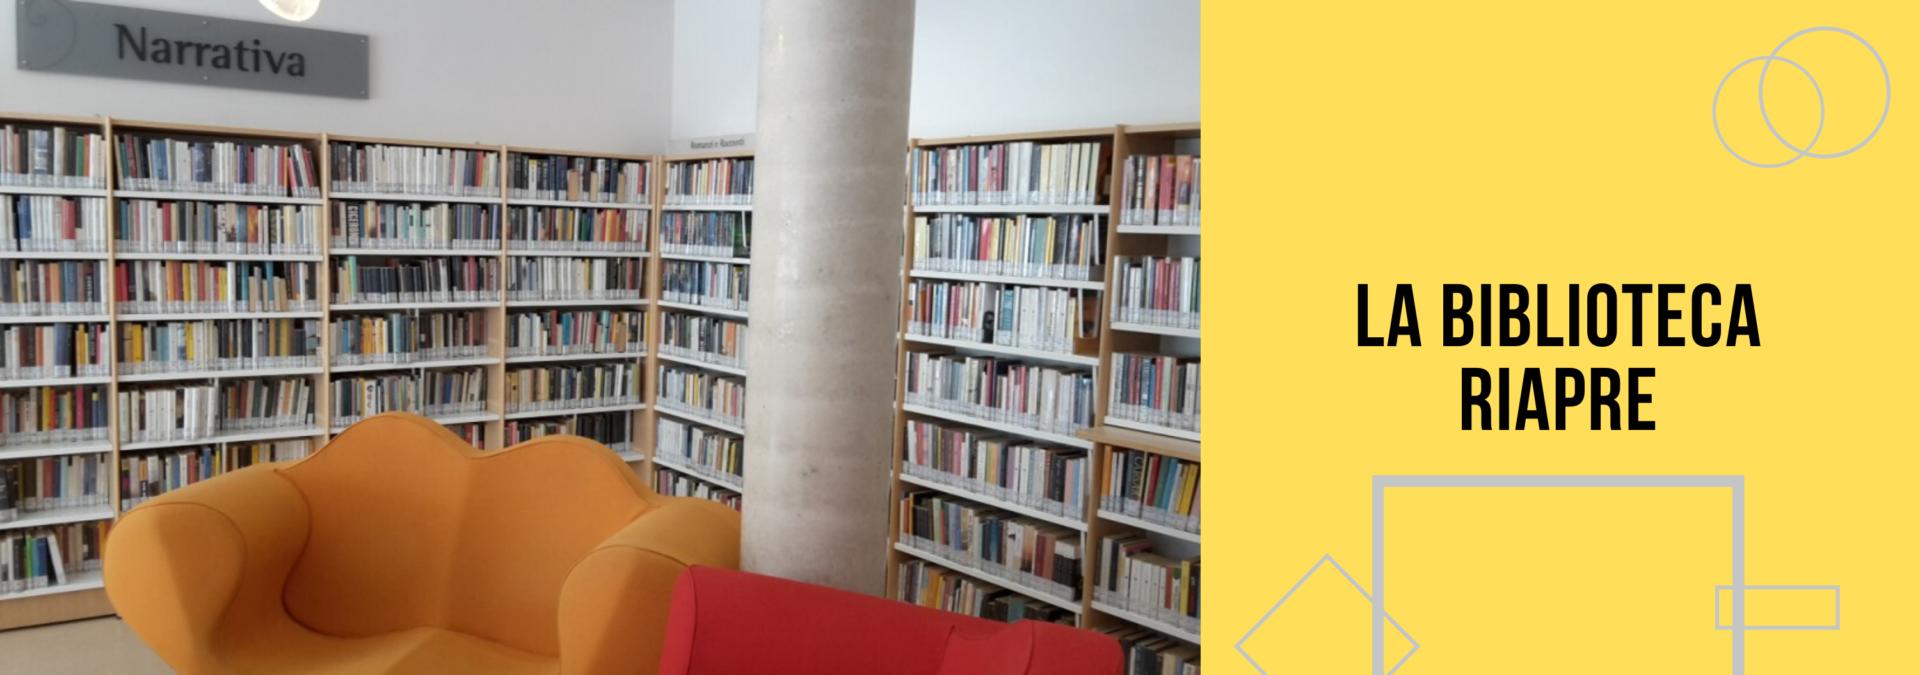 La biblioteca riapre